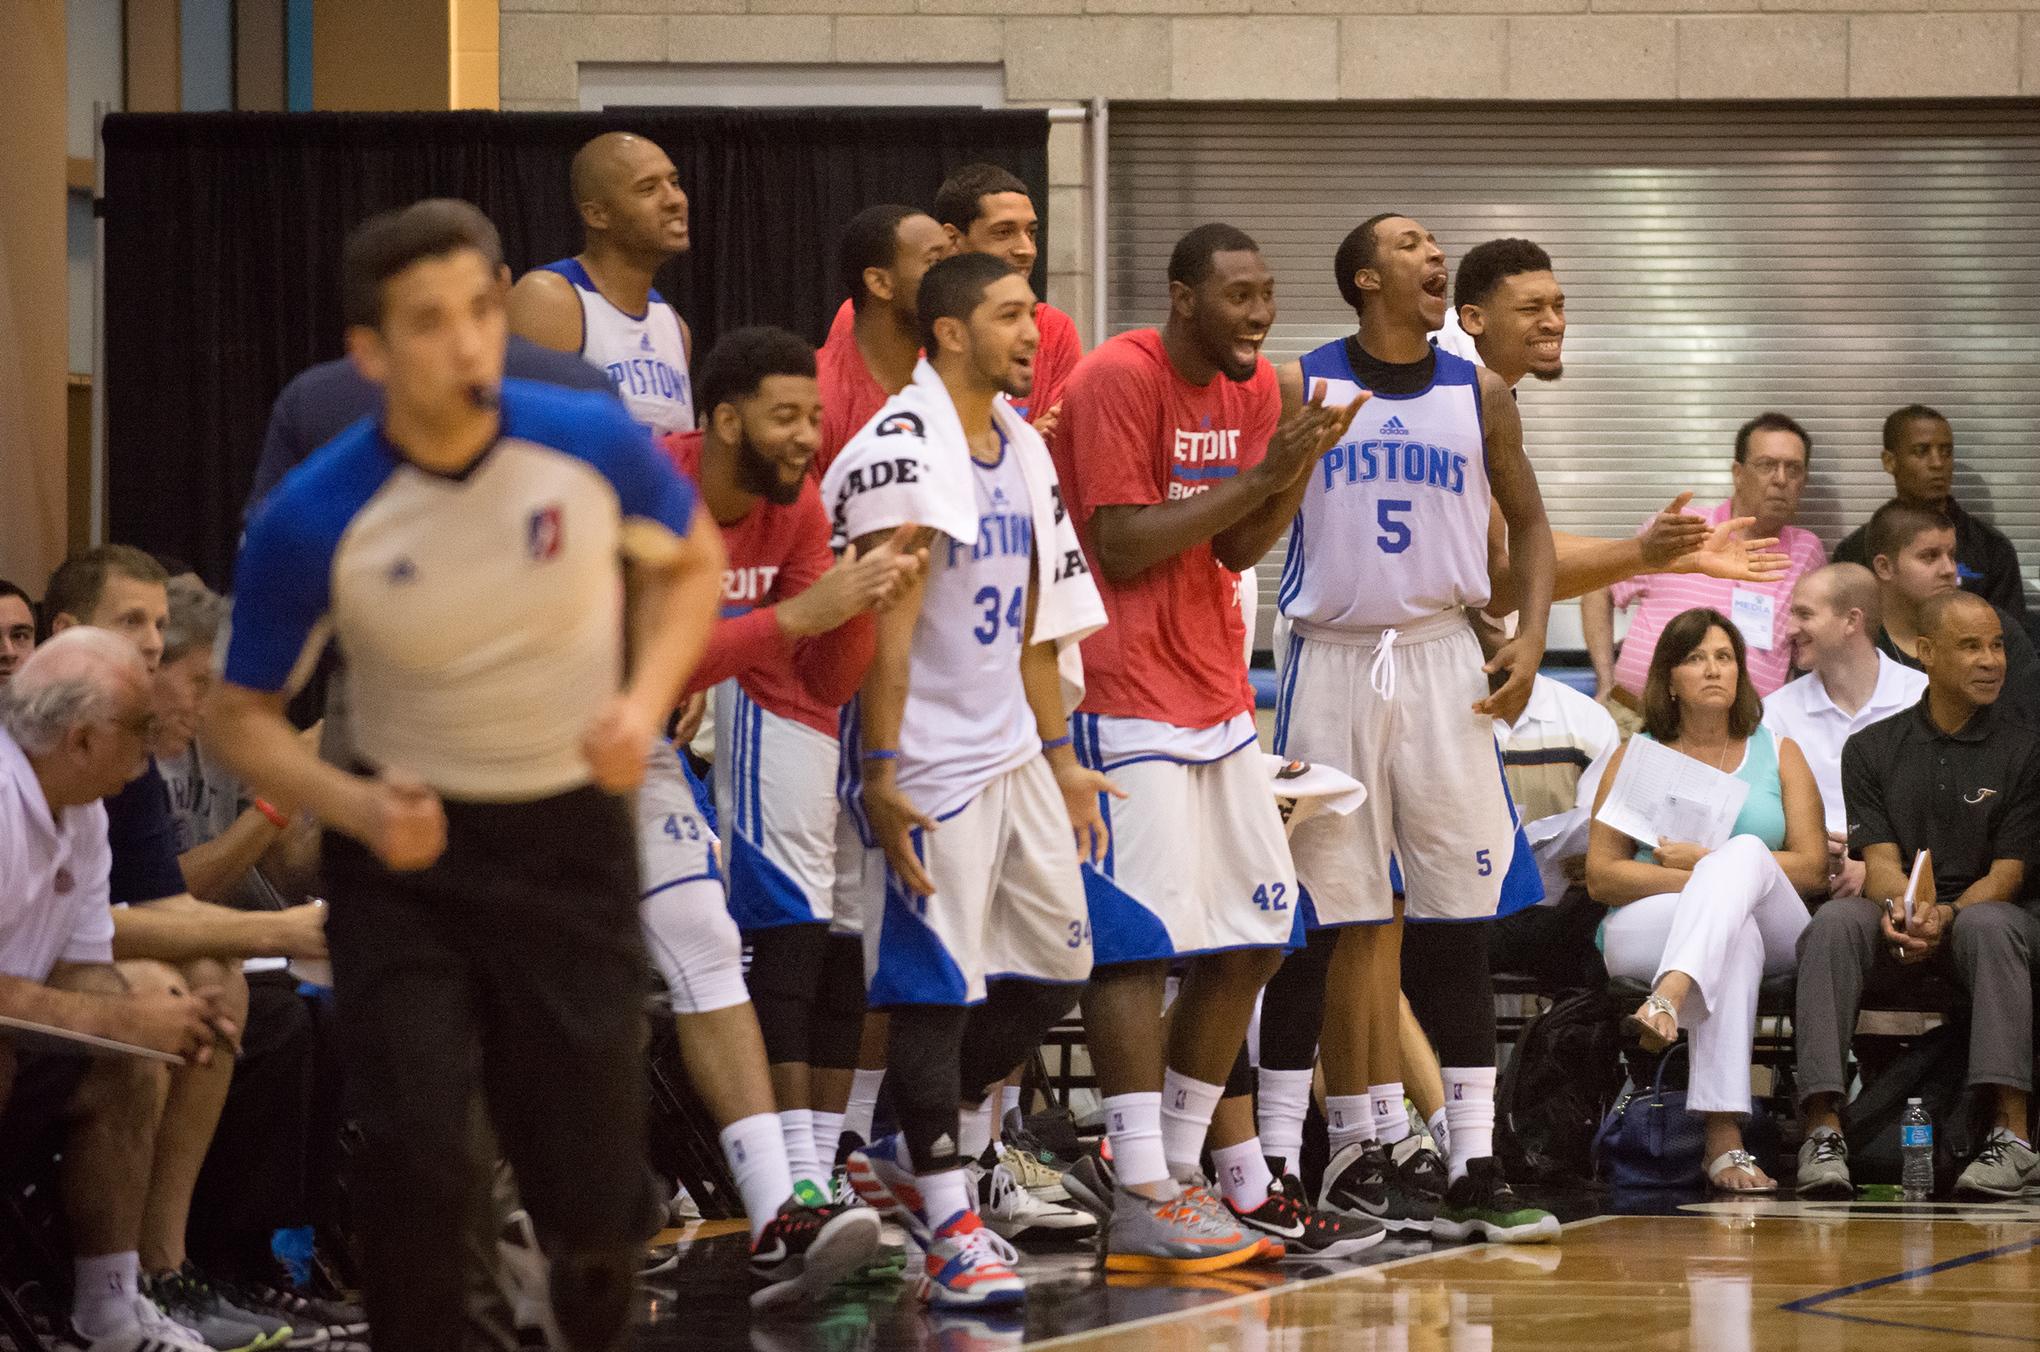 d2515a96766a An inside look at the NBA Summer League in Orlando - Detroit Bad Boys